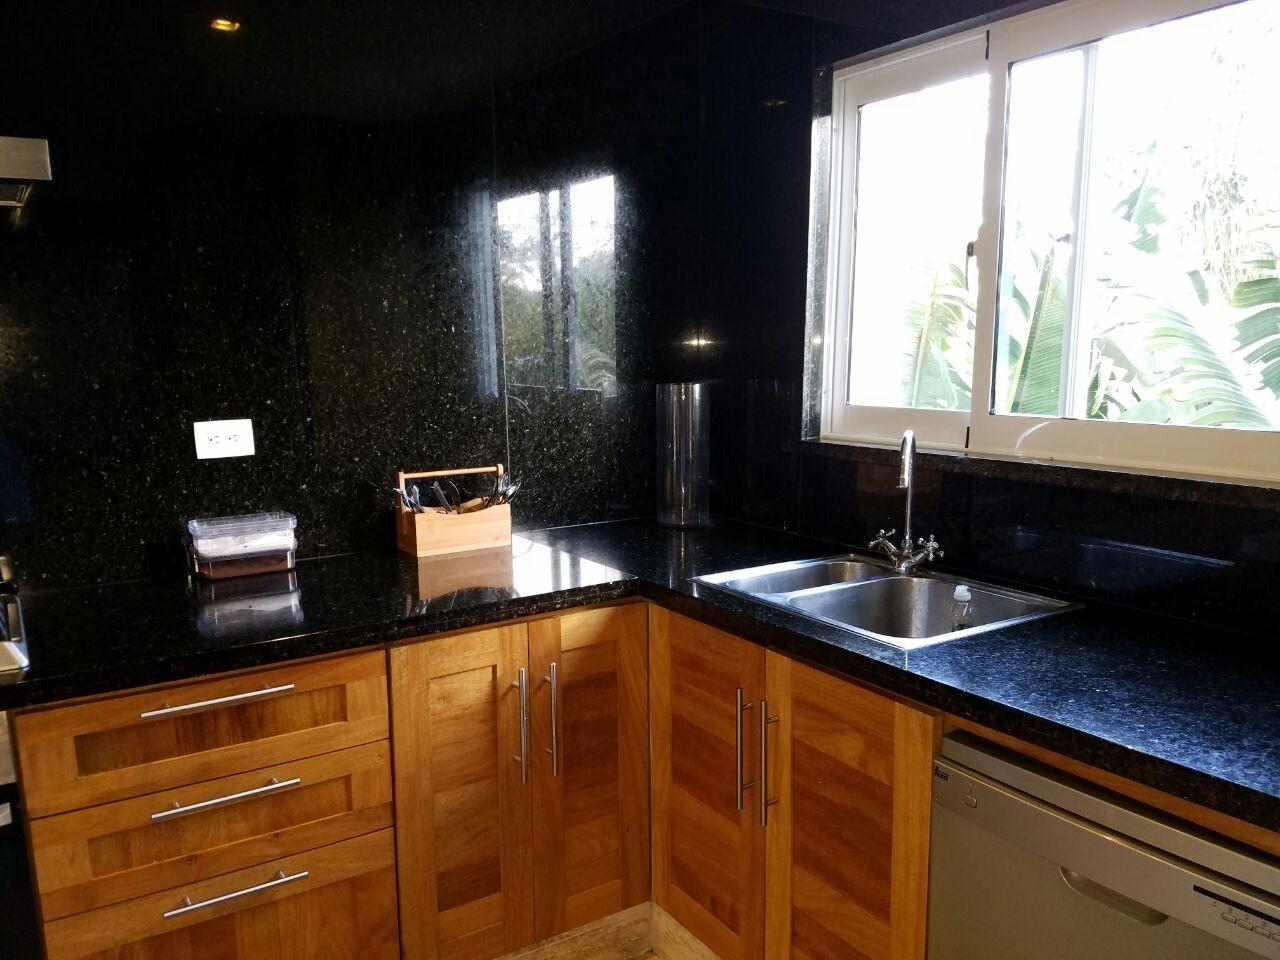 Apartment for sale las terrenas monserrat II kitchen2.jpeg